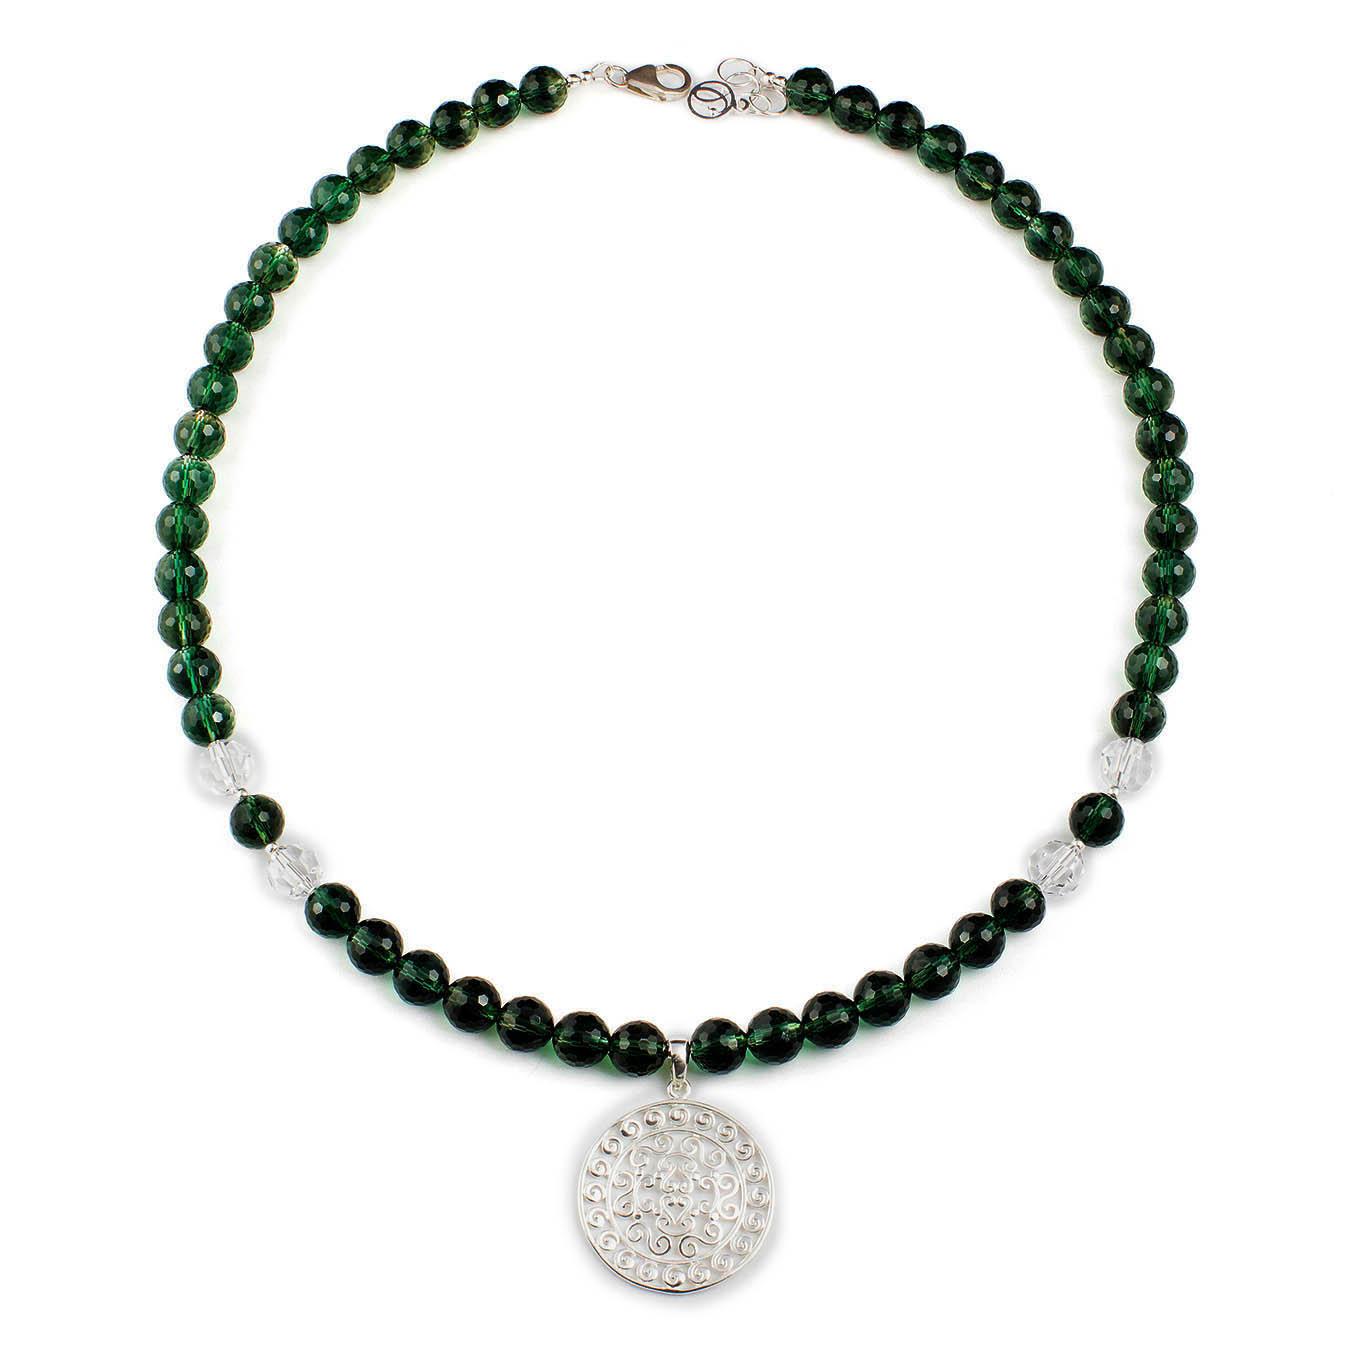 Handcrafted pendant necklace made swarovski and green quartz stones